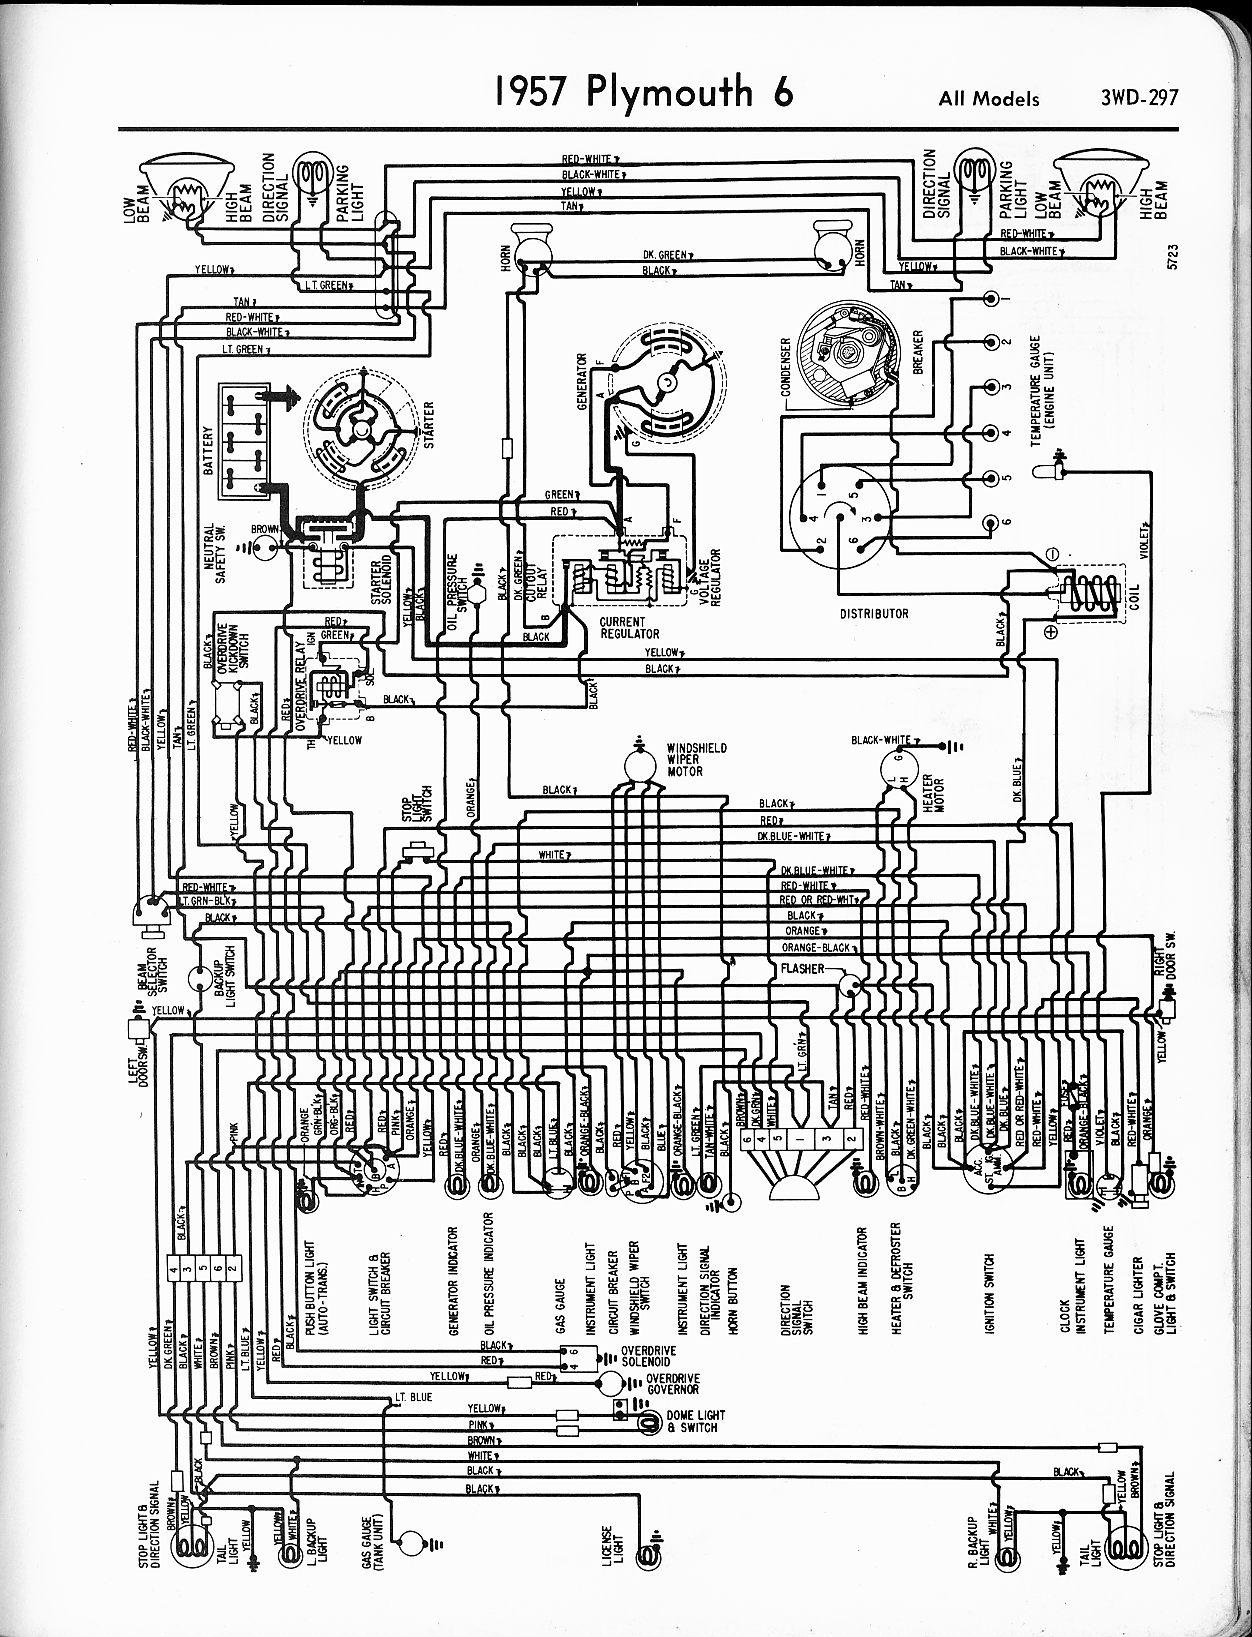 79 plymouth volare wiring diagram wiring library rh 67 nepalchitragupta org